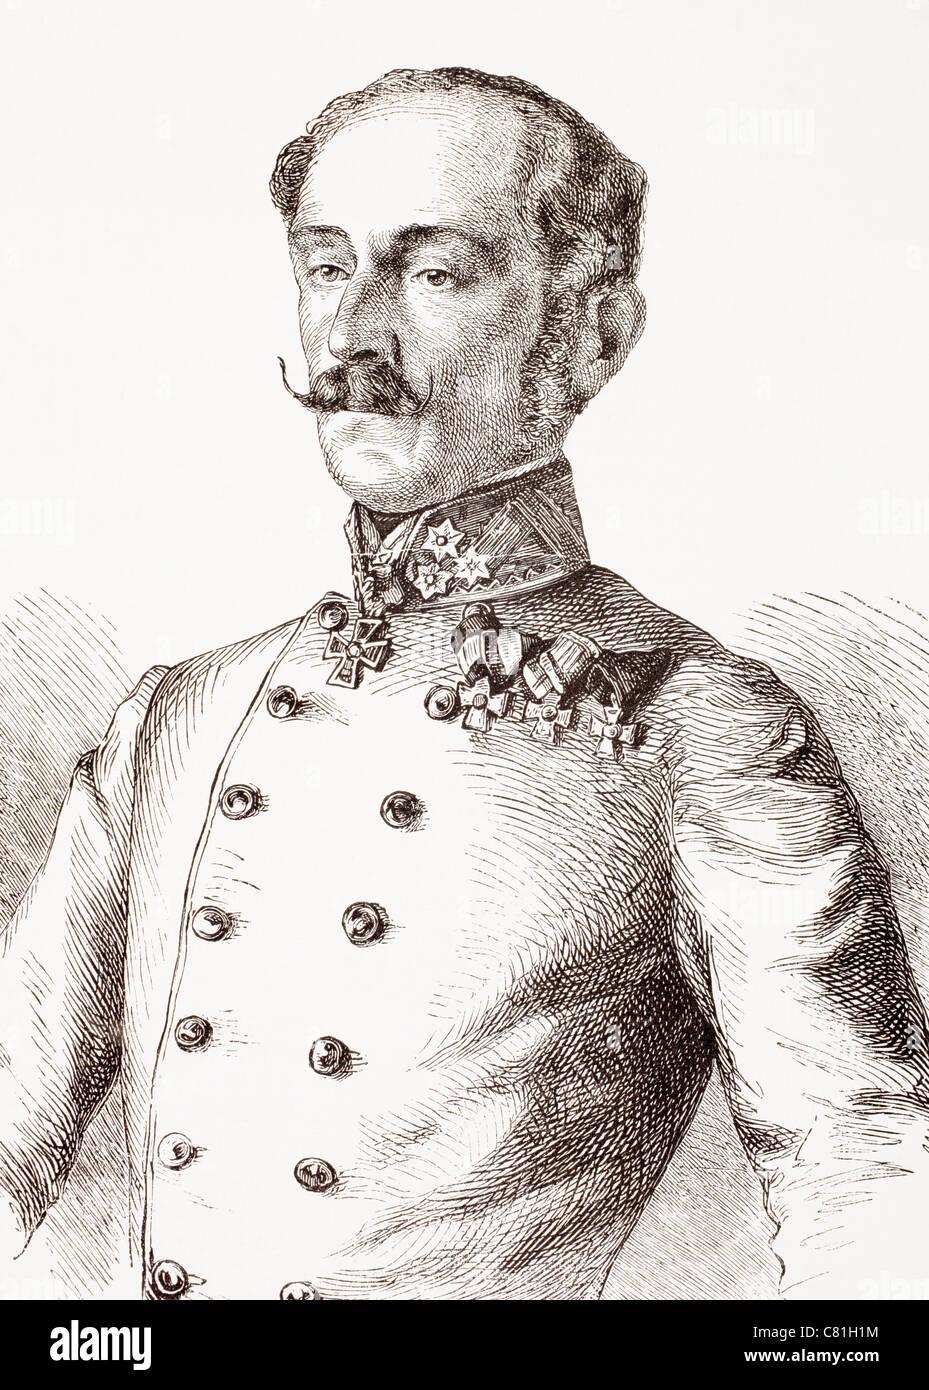 Ludwig August Ritter von Benedek, 1804 – 1881, aka Lajos Benedek. Austrian general of Hungarian descent. - Stock Image